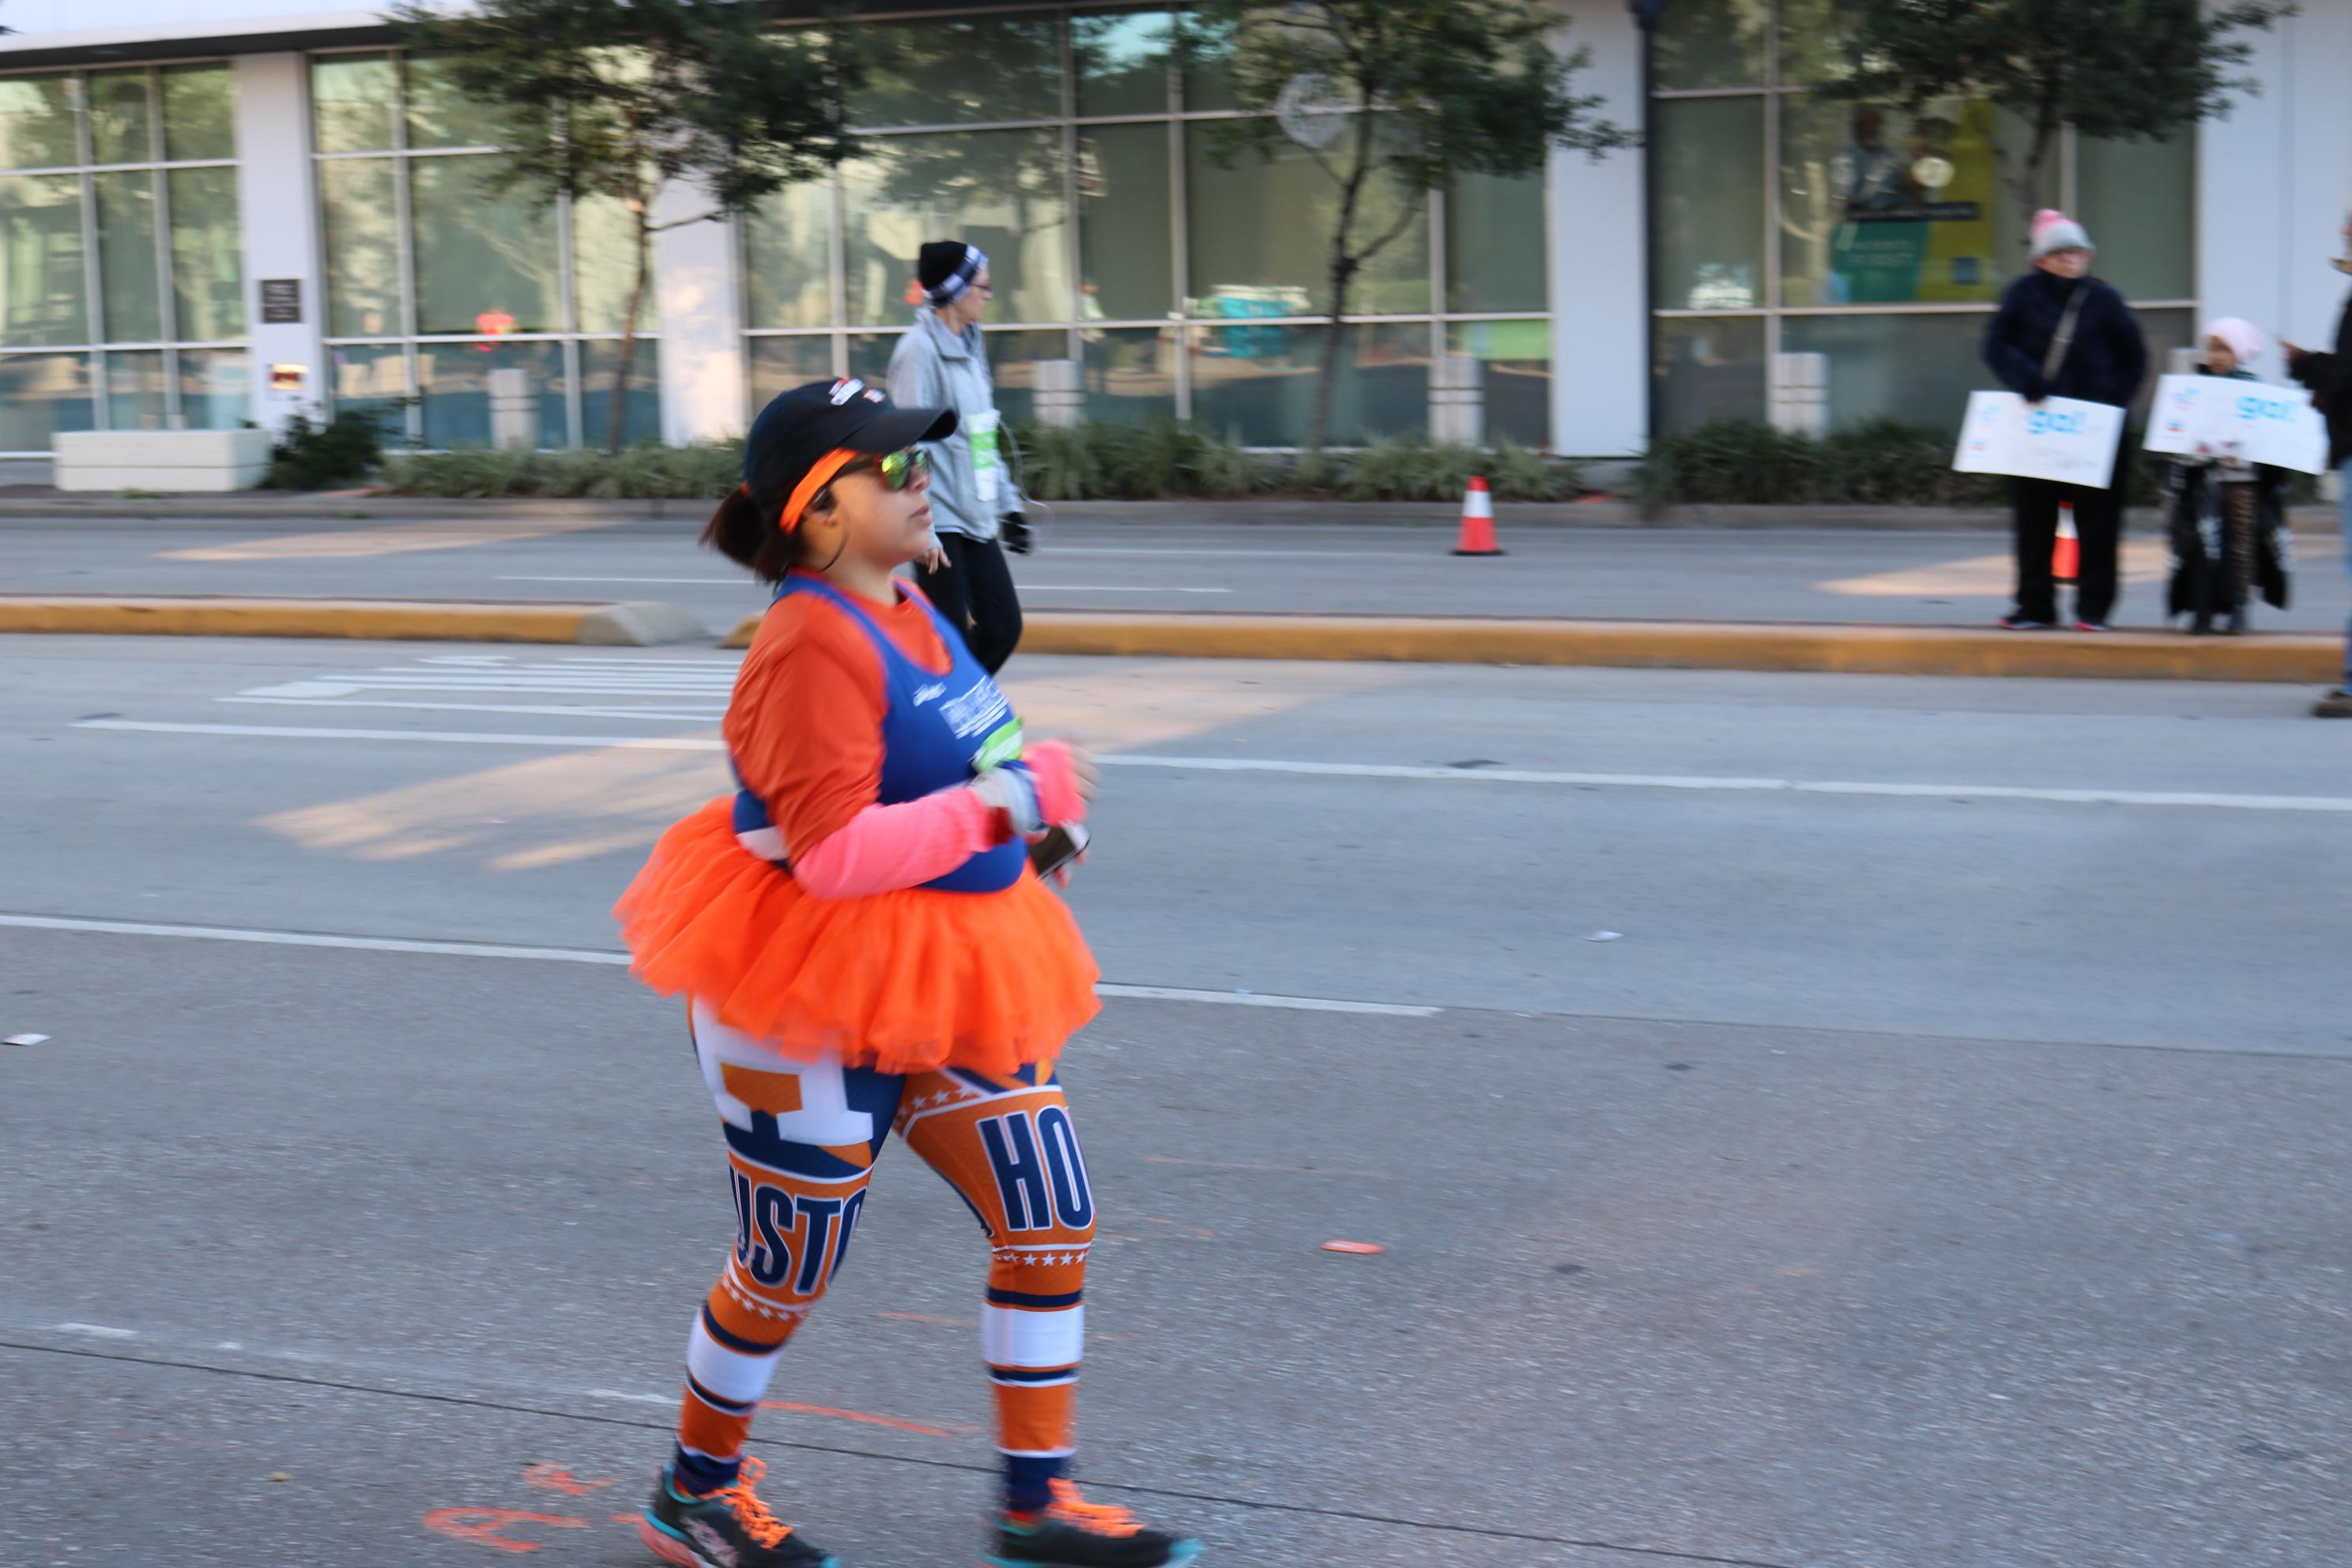 <div class='meta'><div class='origin-logo' data-origin='none'></div><span class='caption-text' data-credit=''>Chevron Houston Marathon and Aramco Half Marathon on Sunday, January 14, 2018</span></div>